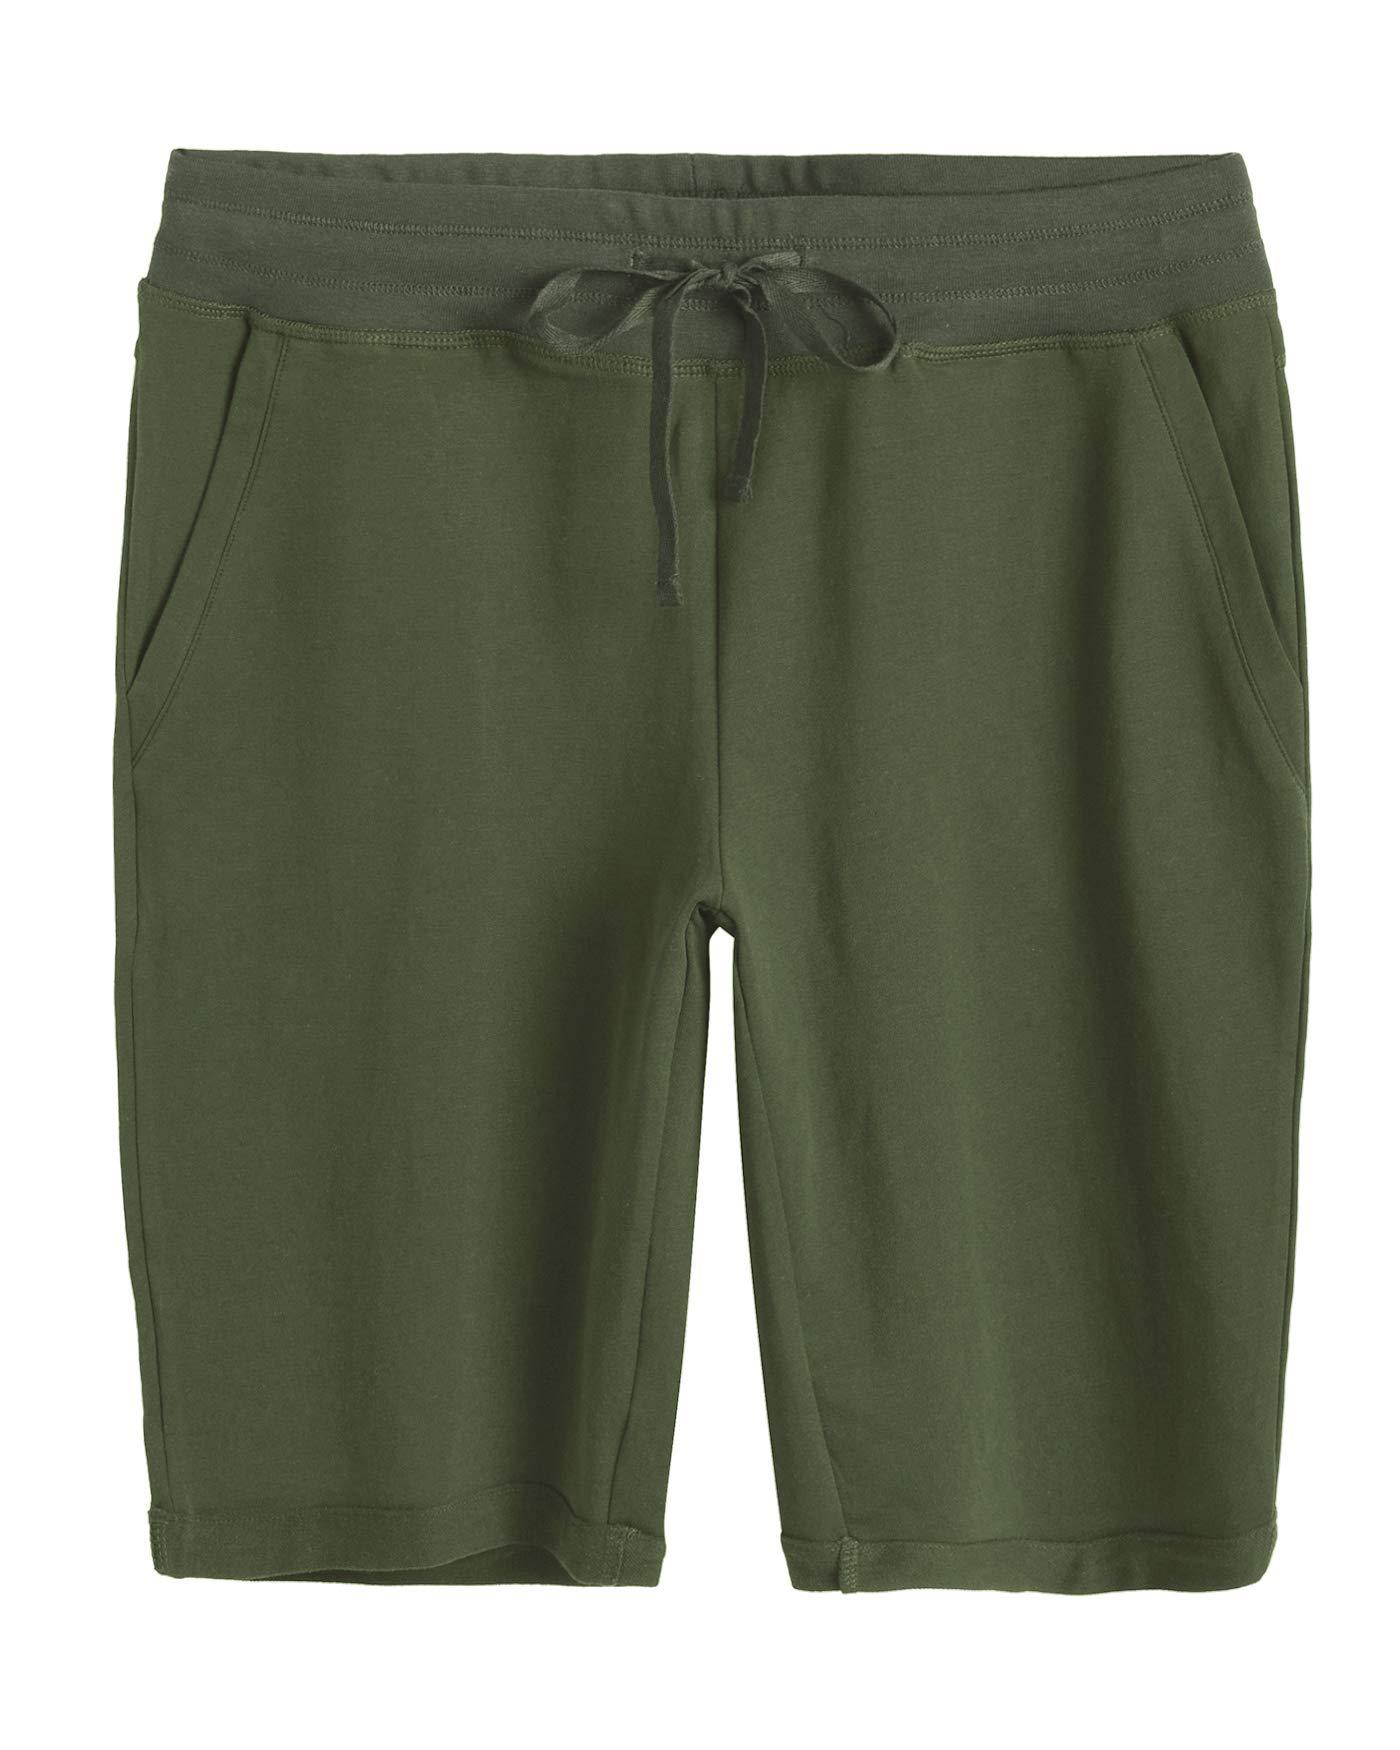 Weintee Women's Cotton Bermuda Shorts with Pockets XL Army Green by Weintee